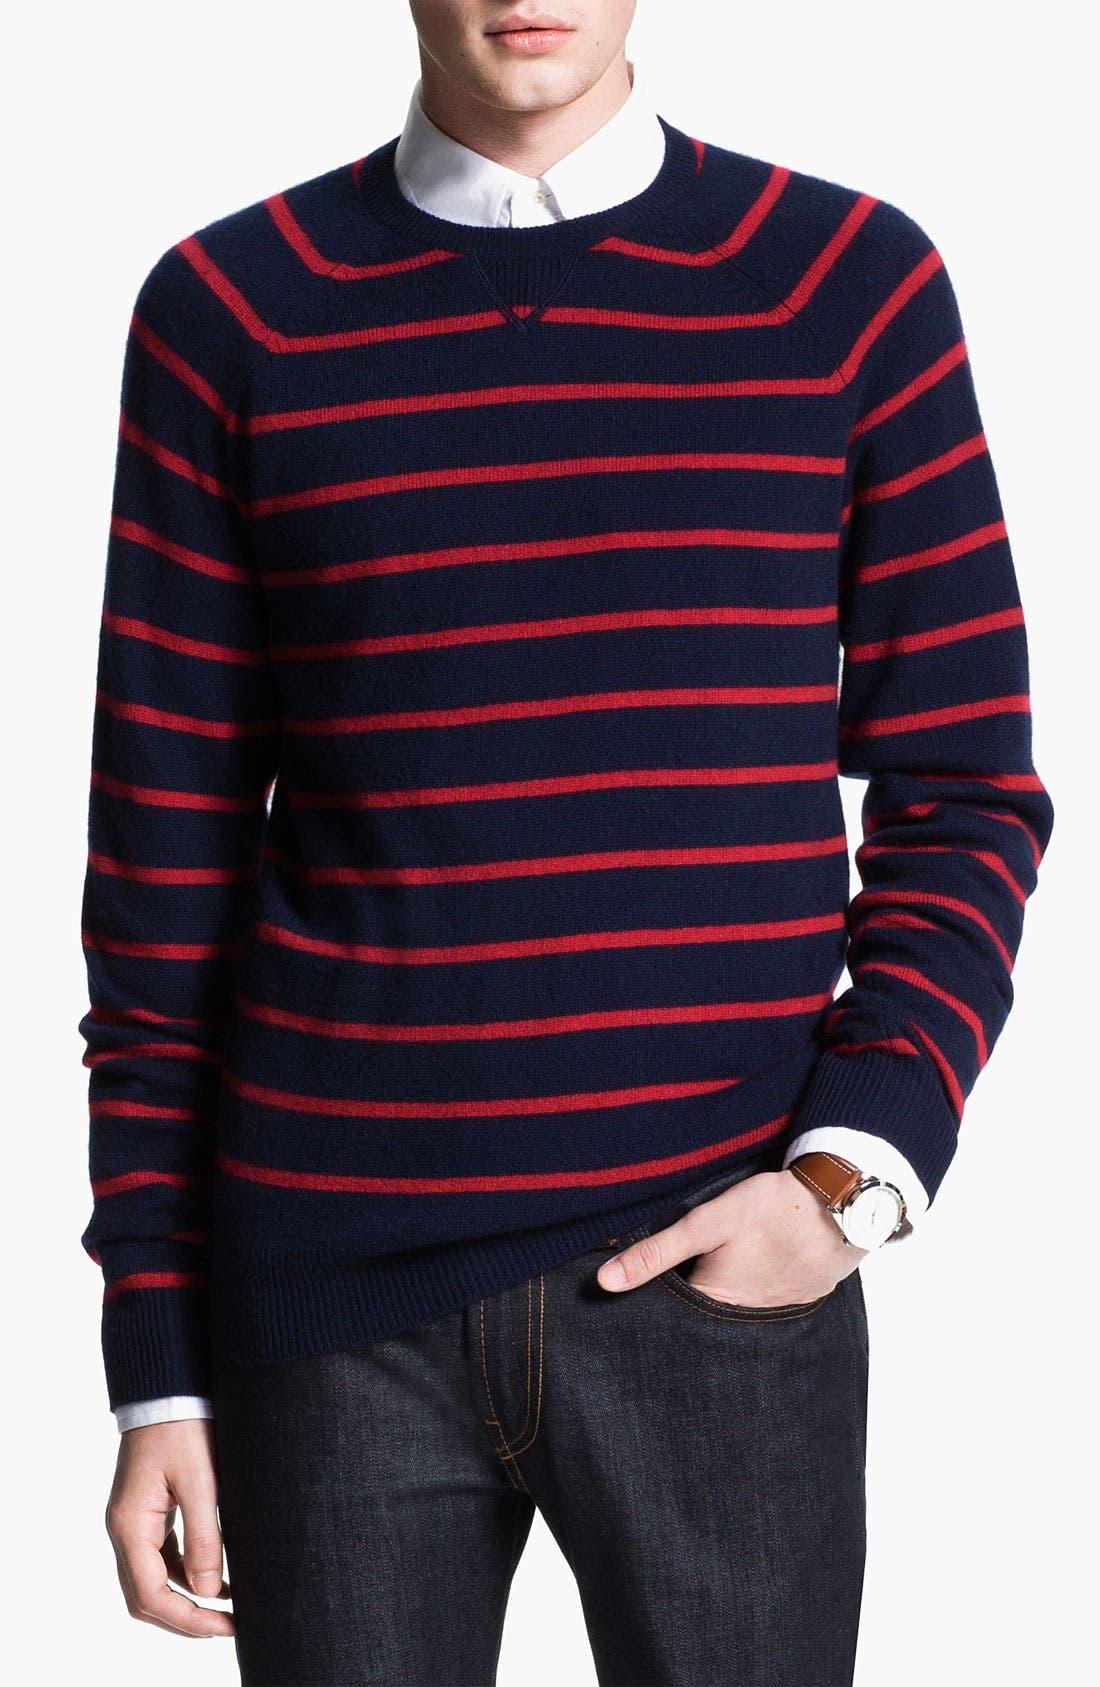 Main Image - 1901 Stripe Cashmere Sweater